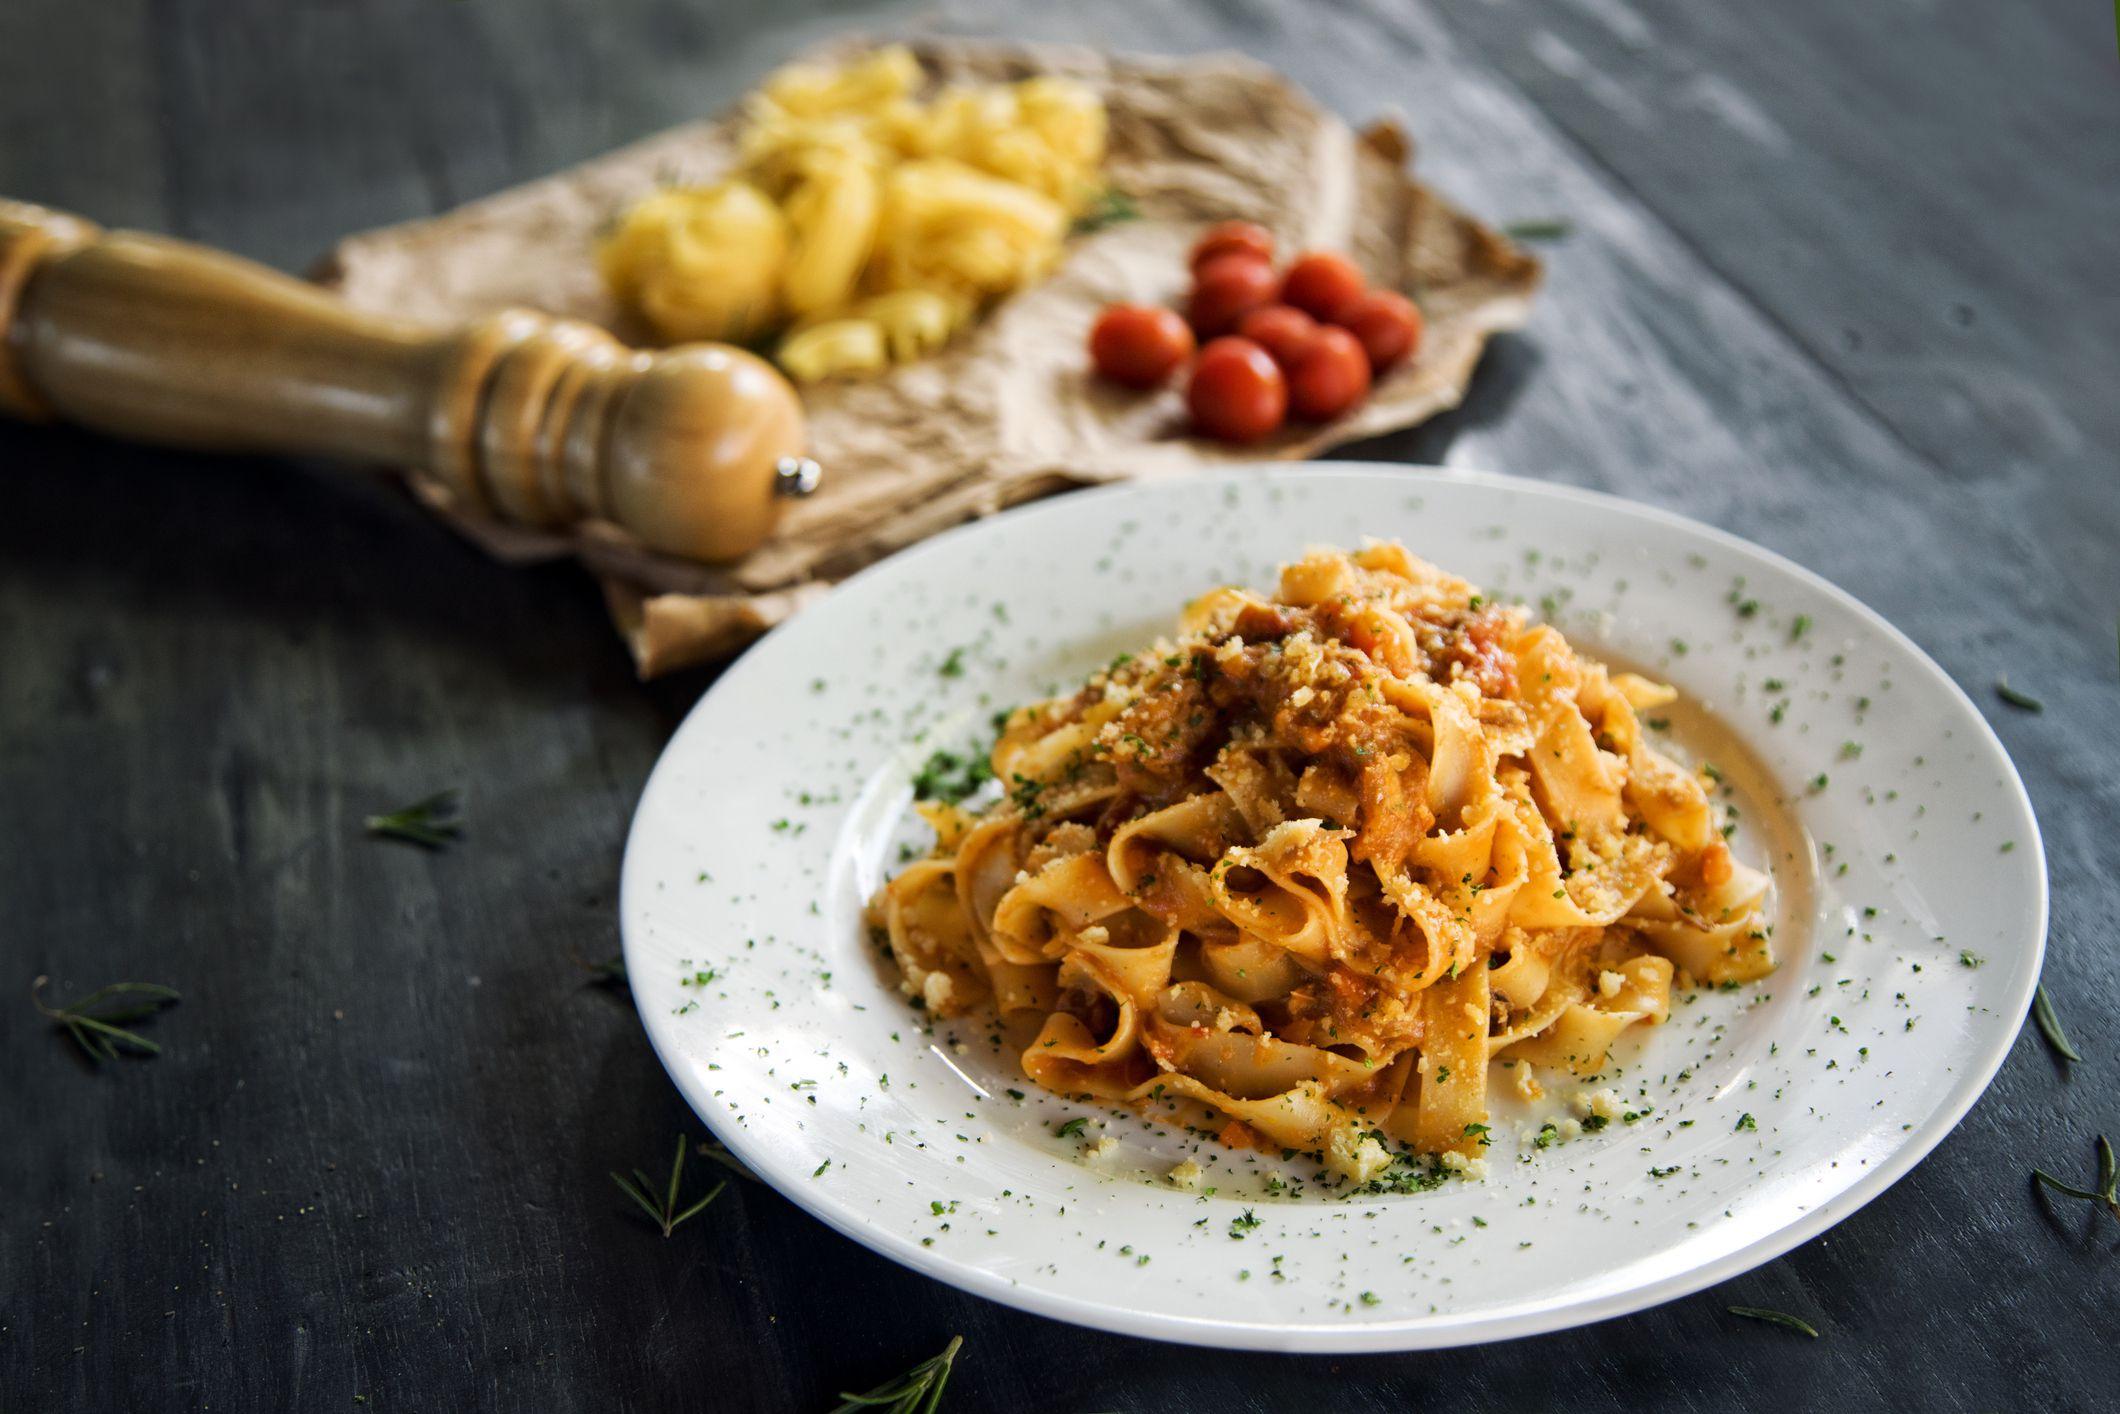 How to Make a Classic Bolognese Sauce (Sugo alla Bolognese)